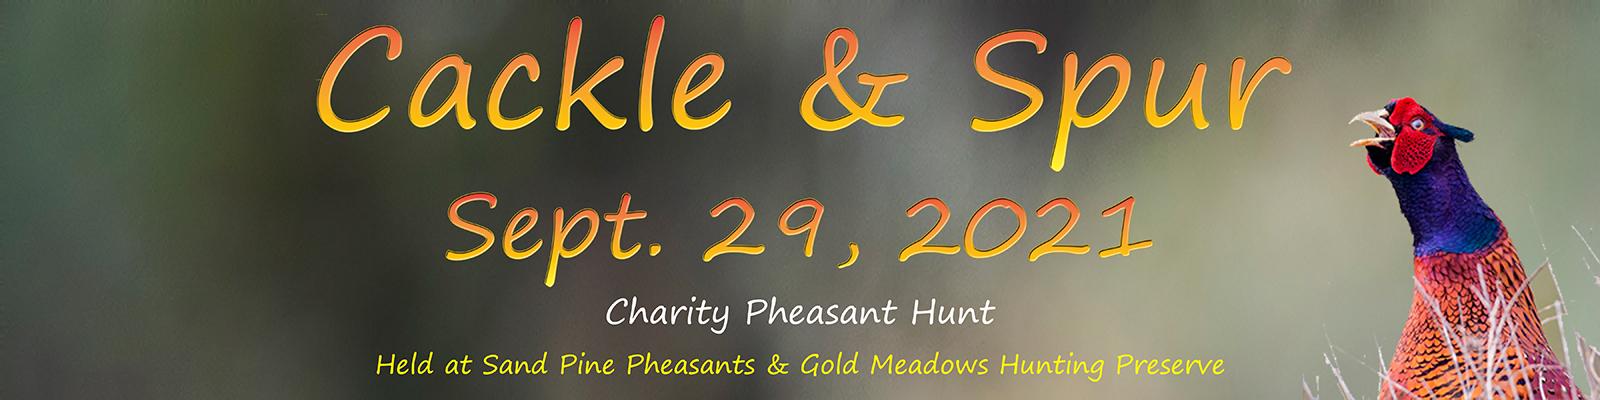 Cackle & Spur event September 29th